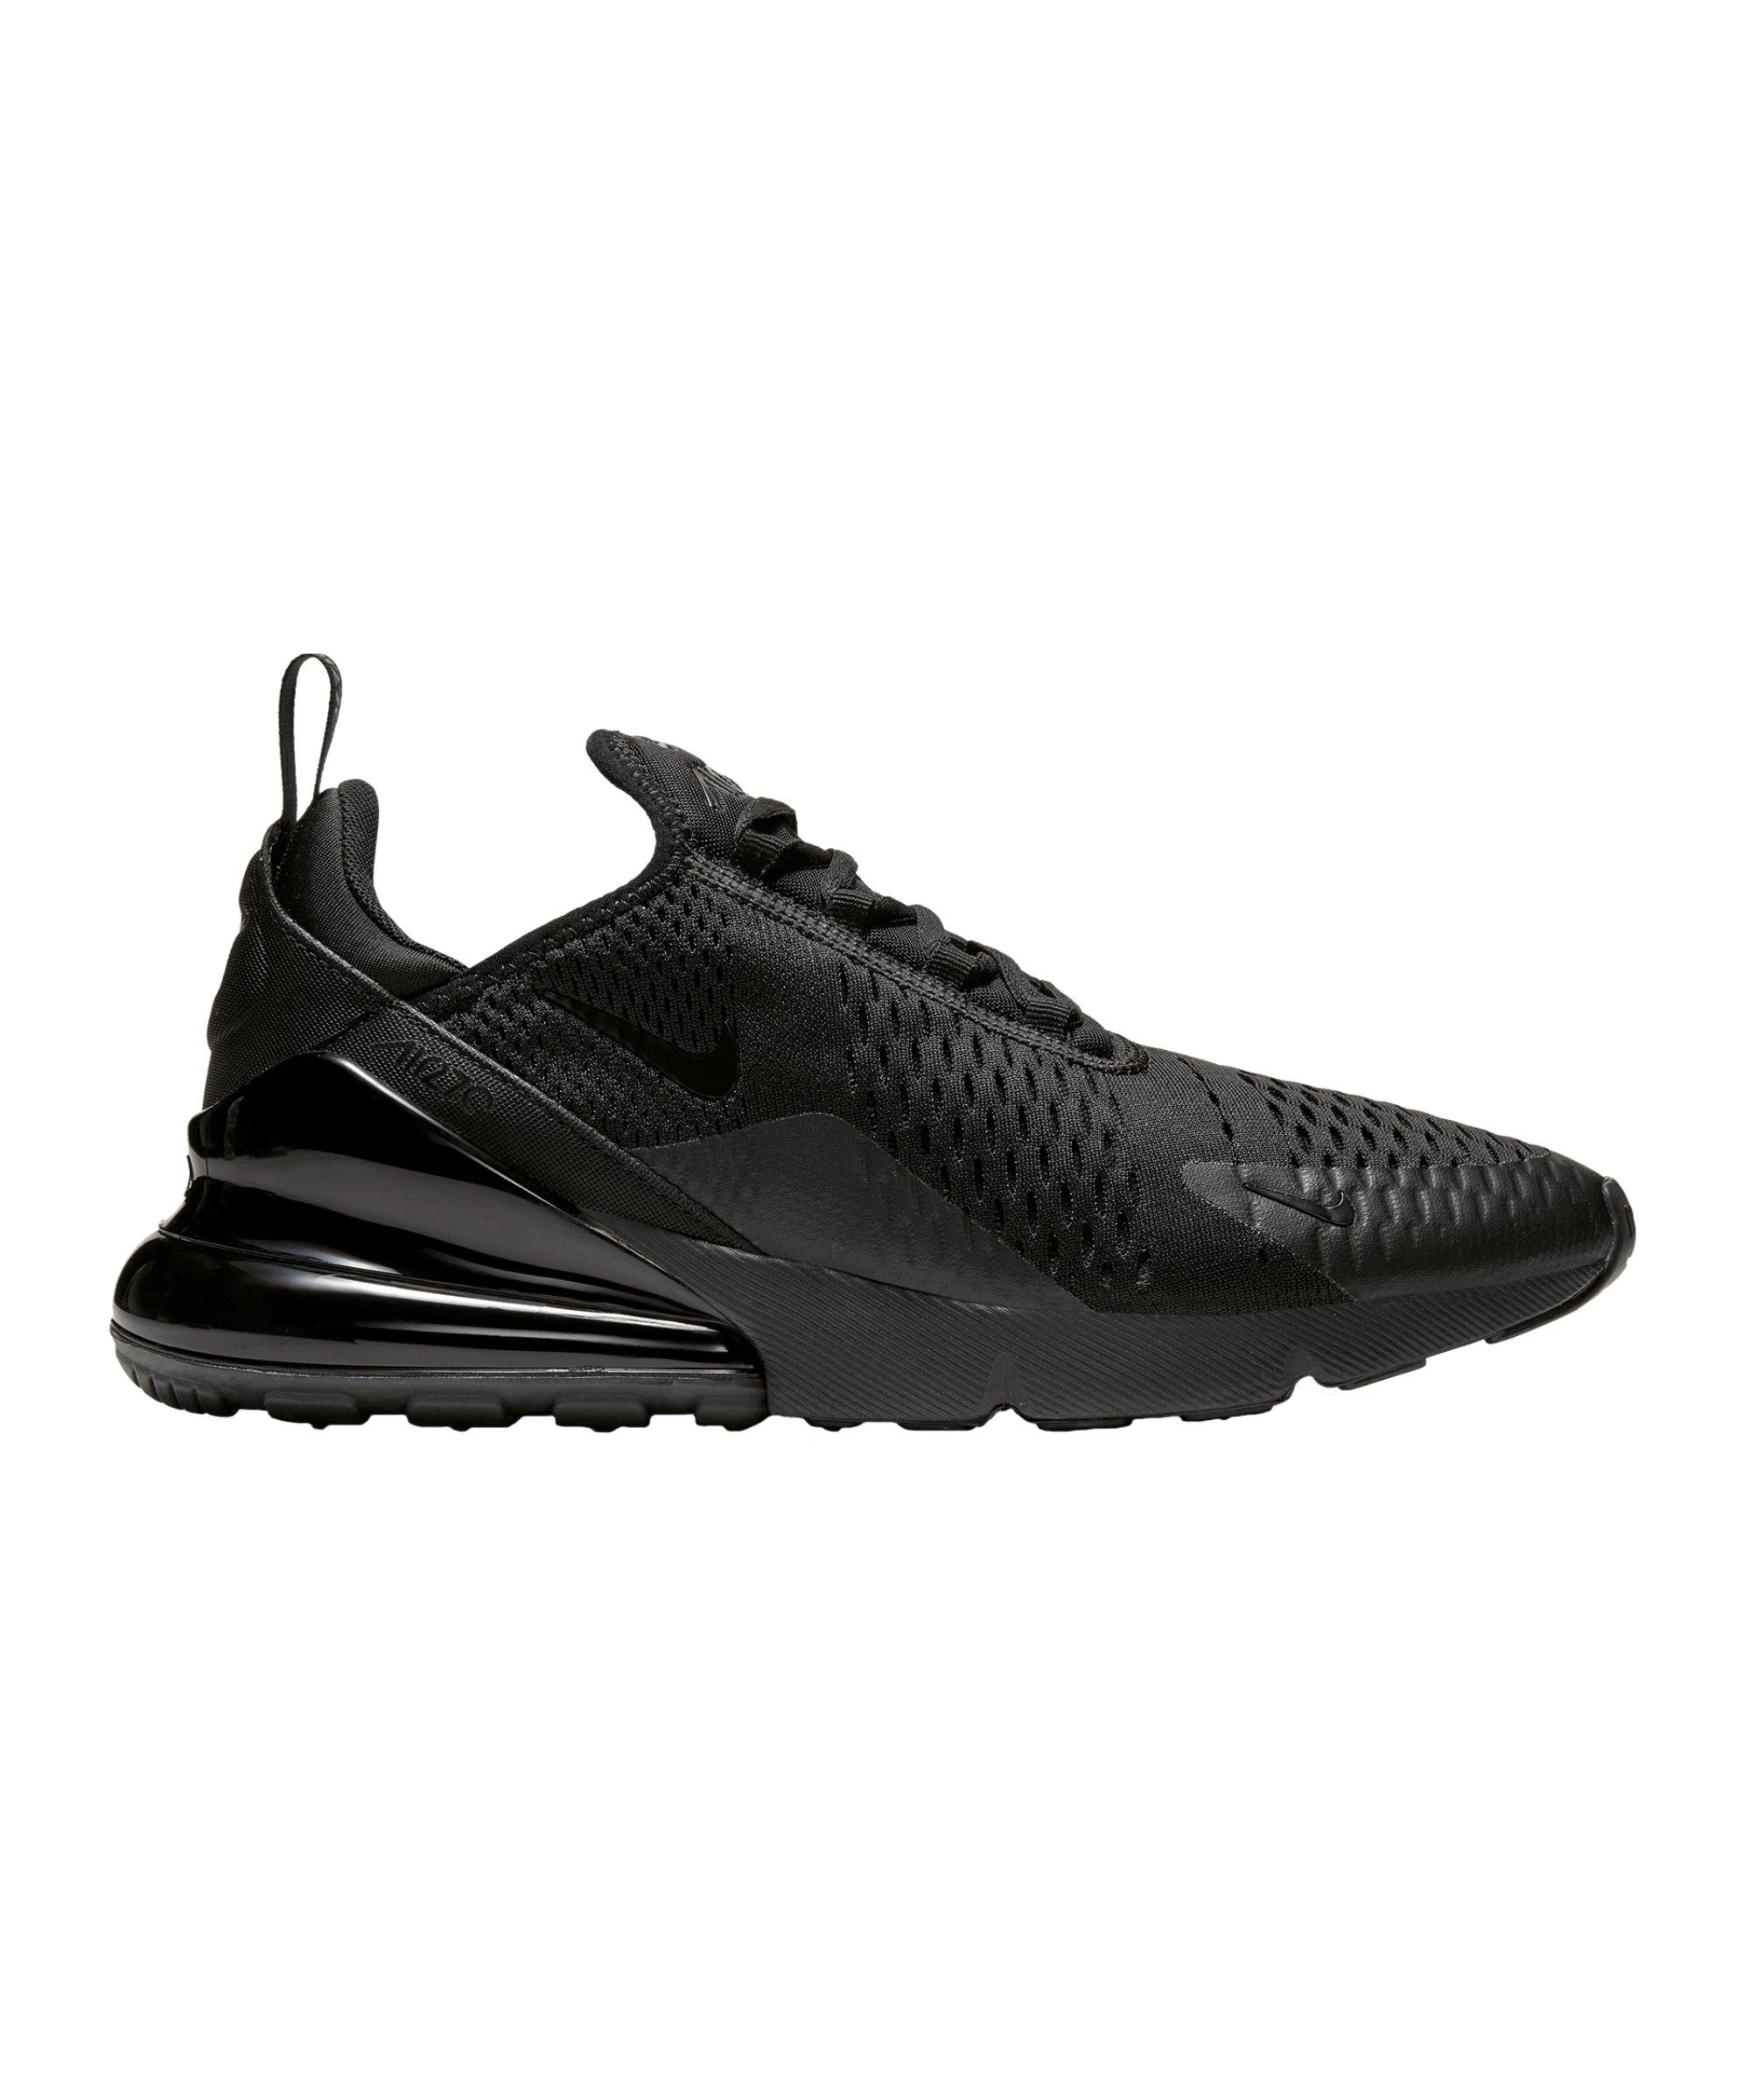 Nike Air Max 270 Sneaker Schwarz F005